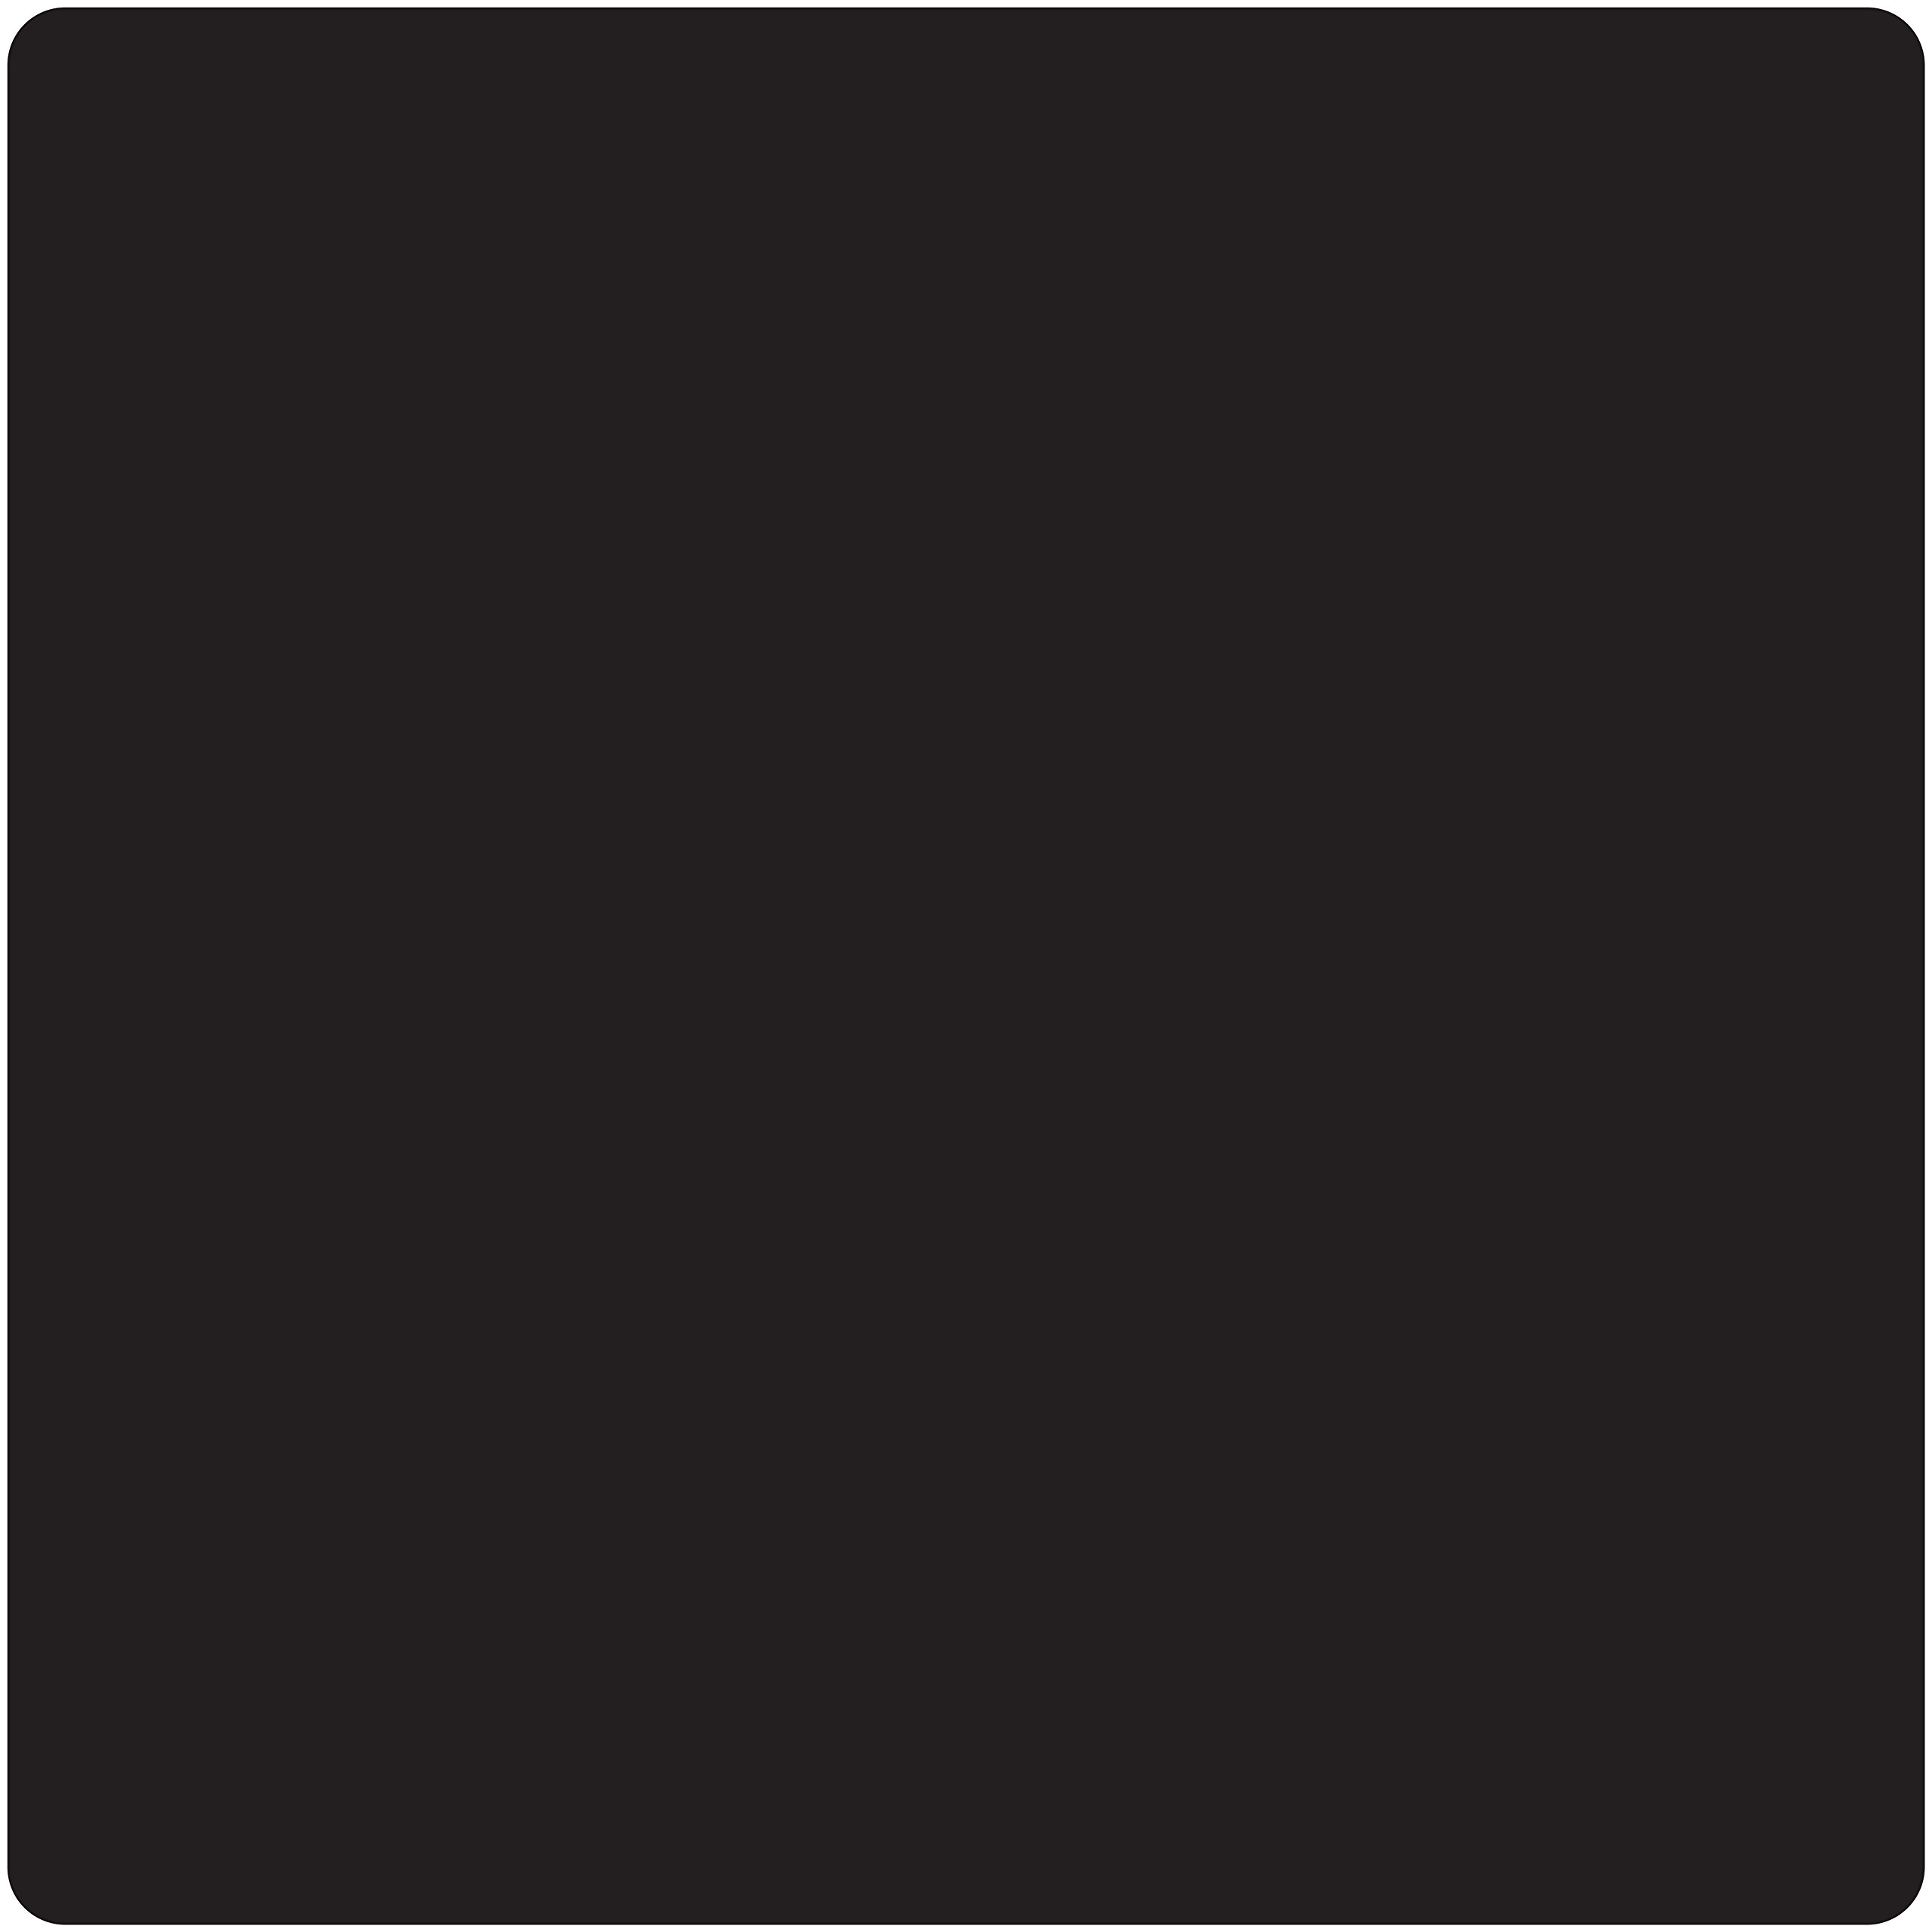 uni-ball PowerTank Retractable Ballpoint Pens, Bold Point (1.0mm), Black Barrel, Black Ink, 12 Count by Uni-ball (Image #2)